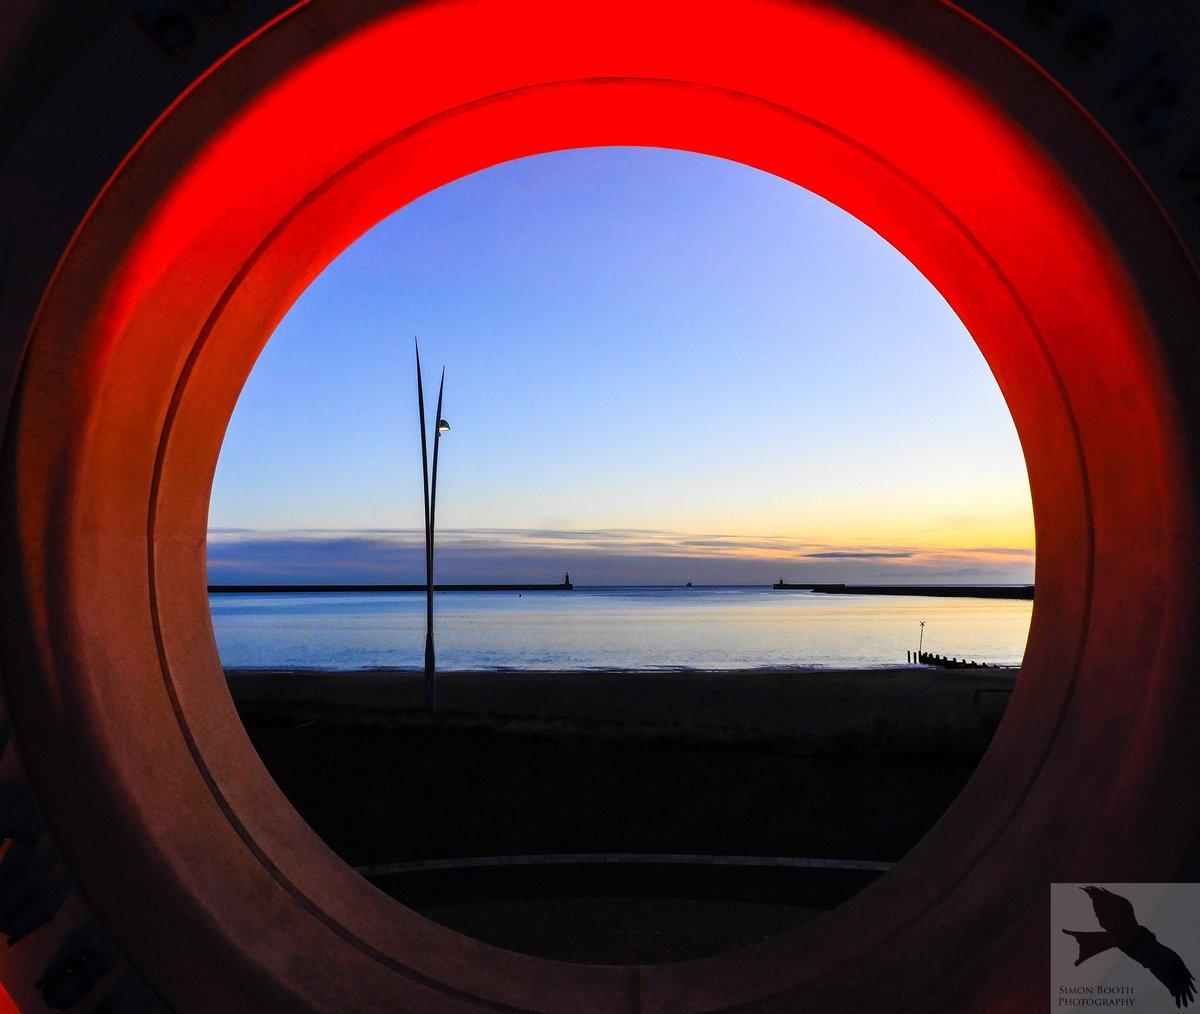 Keeping an eye on the Tyne - Littlehaven,South shields :-)  @SouthShieldsUK @Port_of_Tyne @shieldsgazette @NPhotomag @PaulKingstonITV @StormHour @ThePhotoHour @EarthandClouds #POTW #southshields #Northeast #LoveSouthTyneside #Sunrise #Coast #Photography